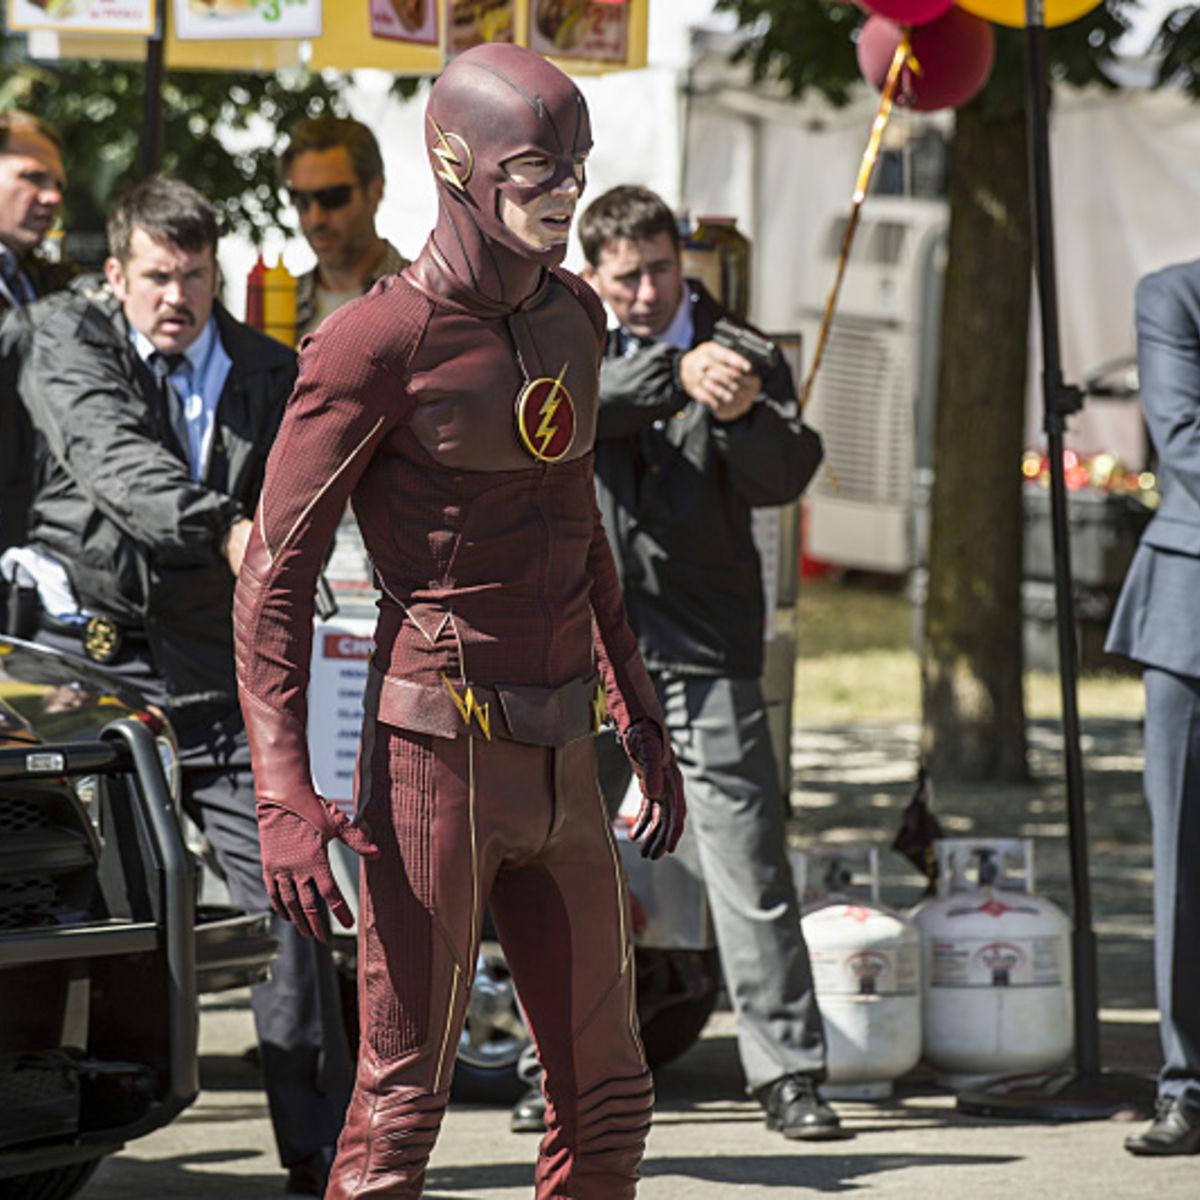 The-Flash-Season2-Episode1-preview-pic-19_0.jpg